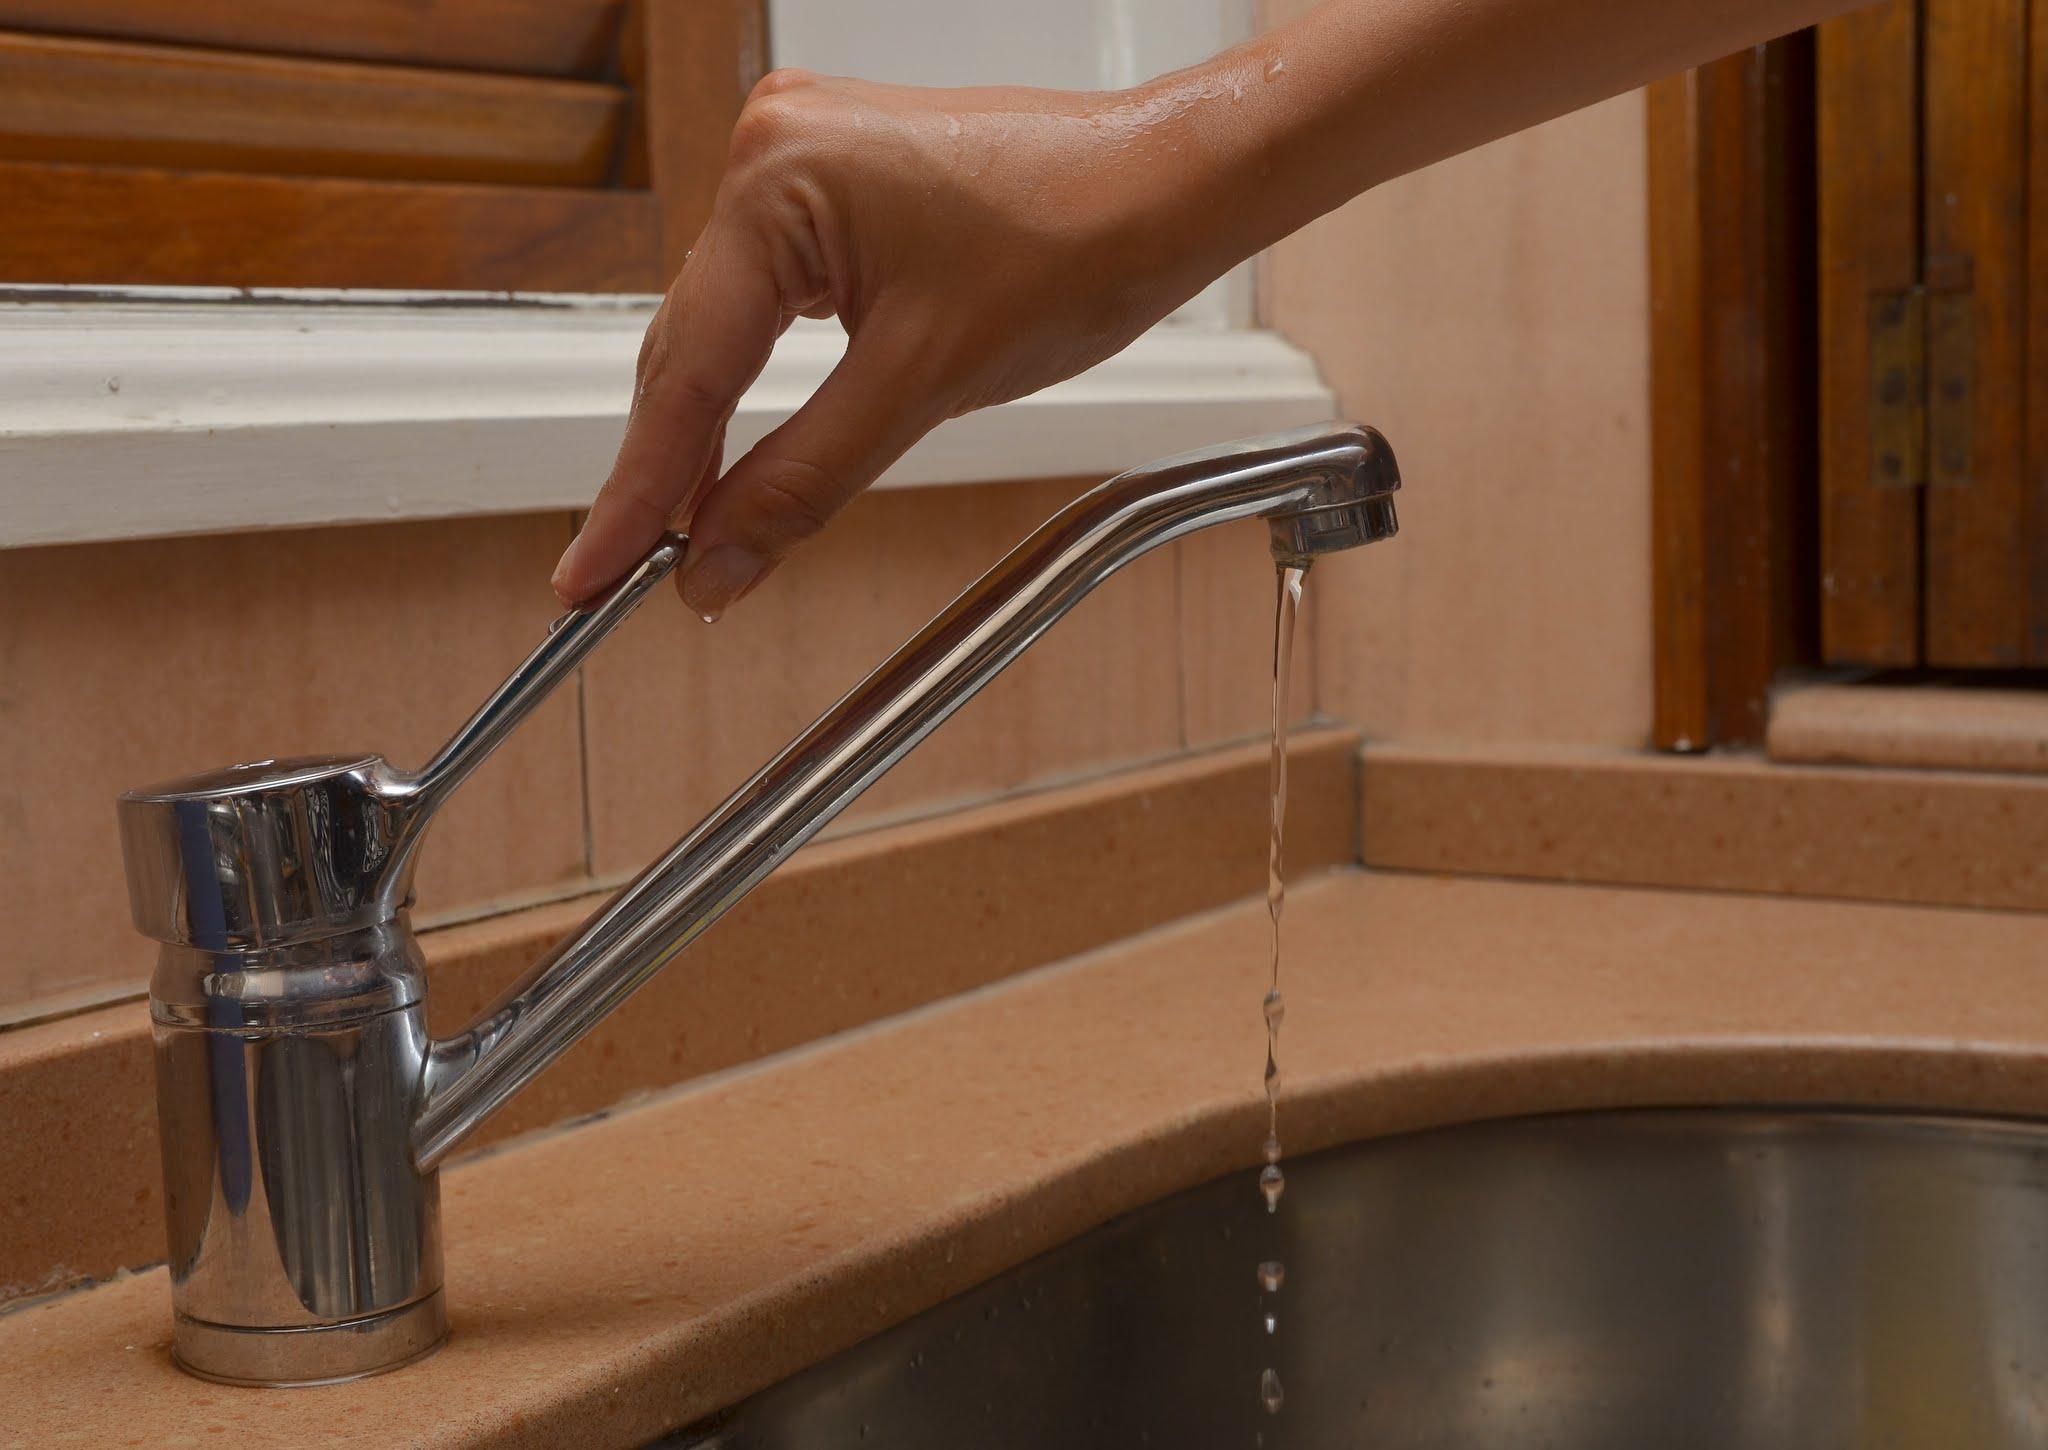 Irrigación aclara que no está entregando menos agua a Aysam